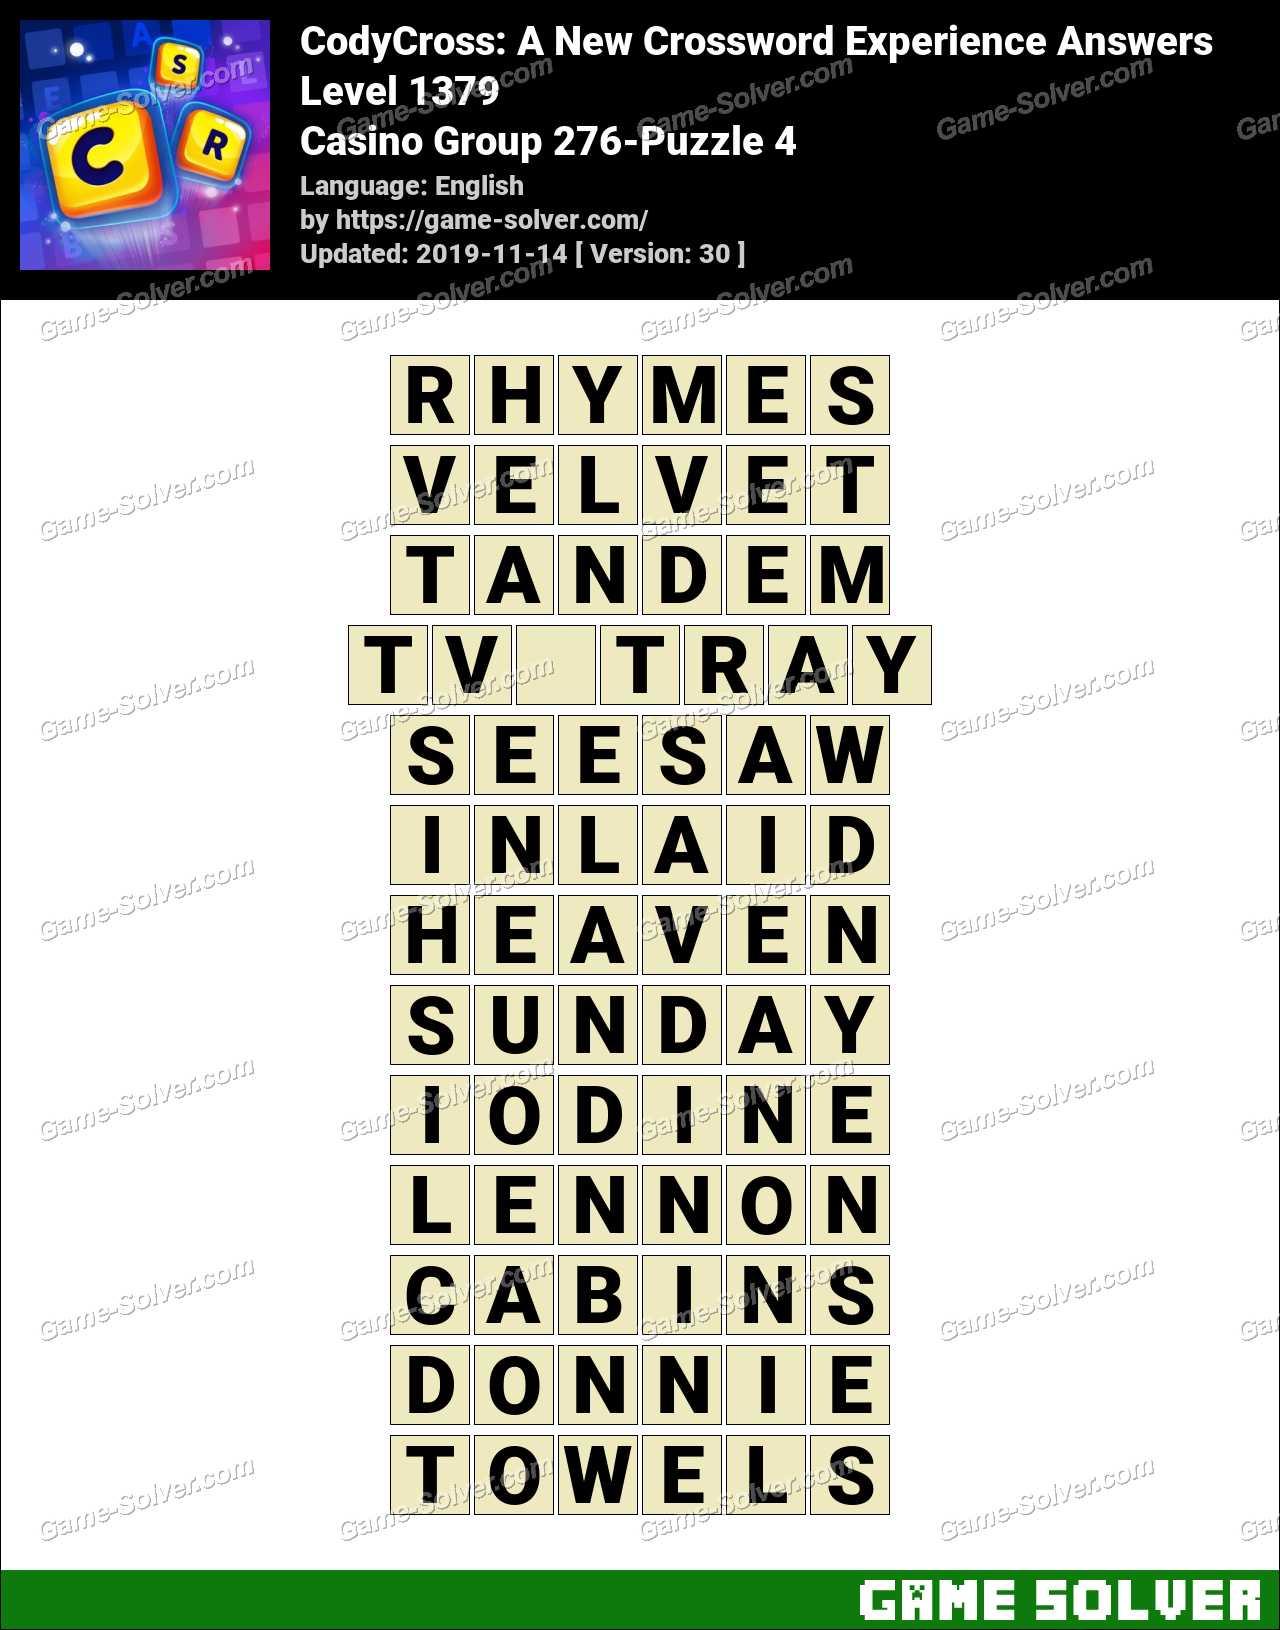 CodyCross Casino Group 276-Puzzle 4 Answers